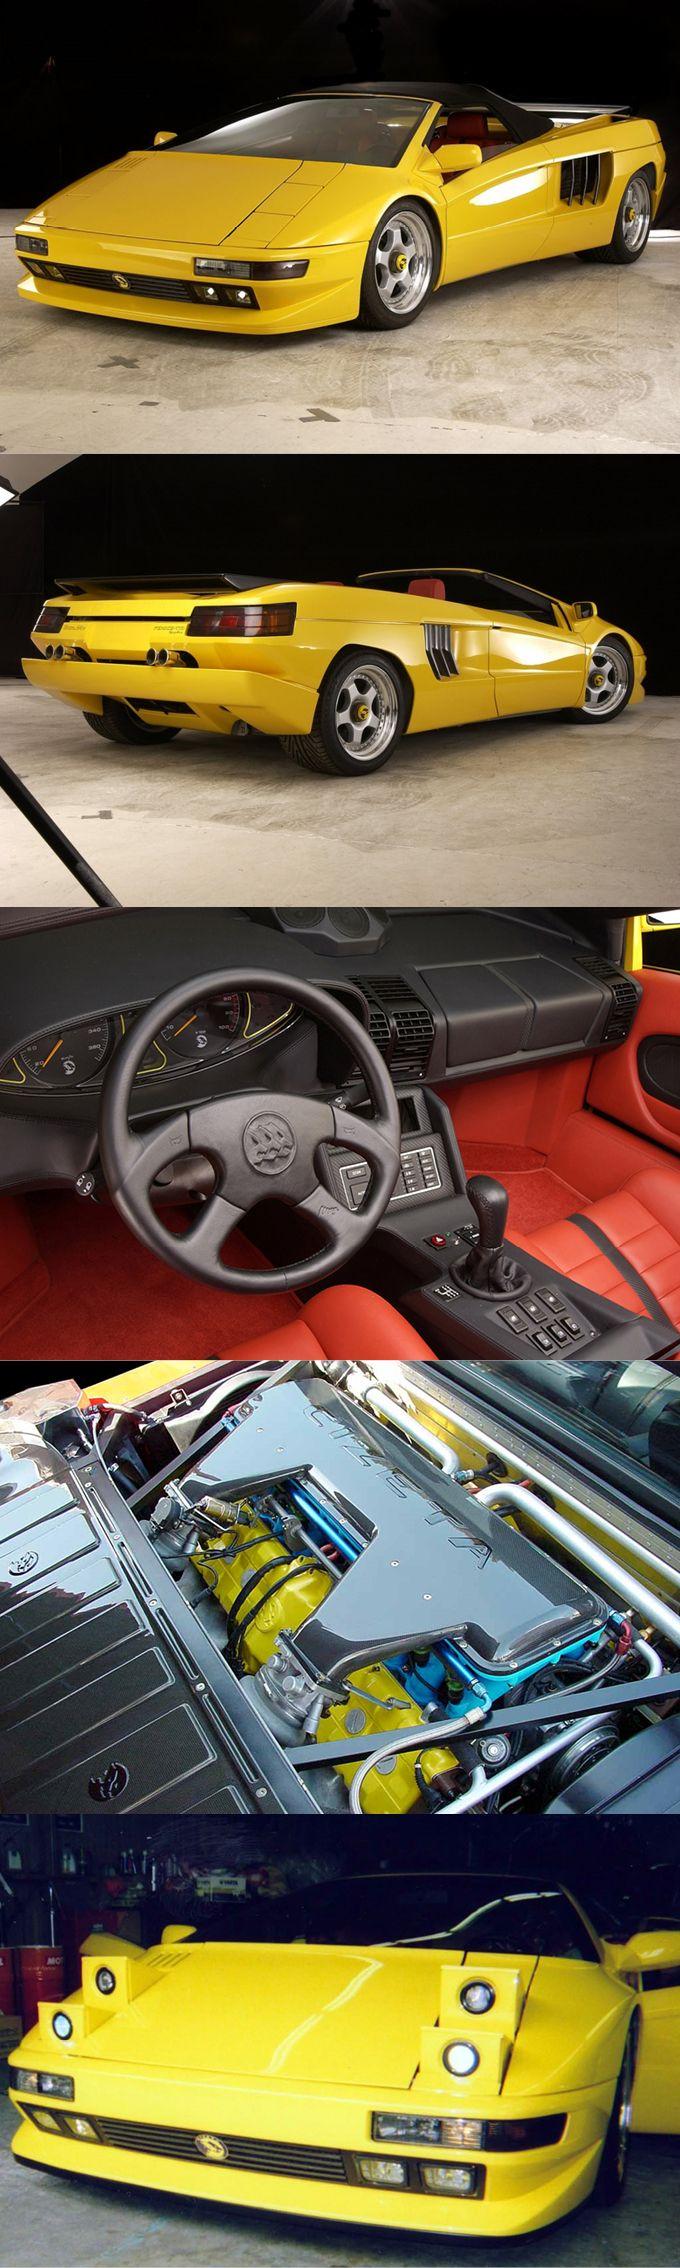 2003 Cizeta TTJ Fenice Spyder / 540hp 6.0l V16 / 1 produced / Marcello Gandini / Italy / yellow red